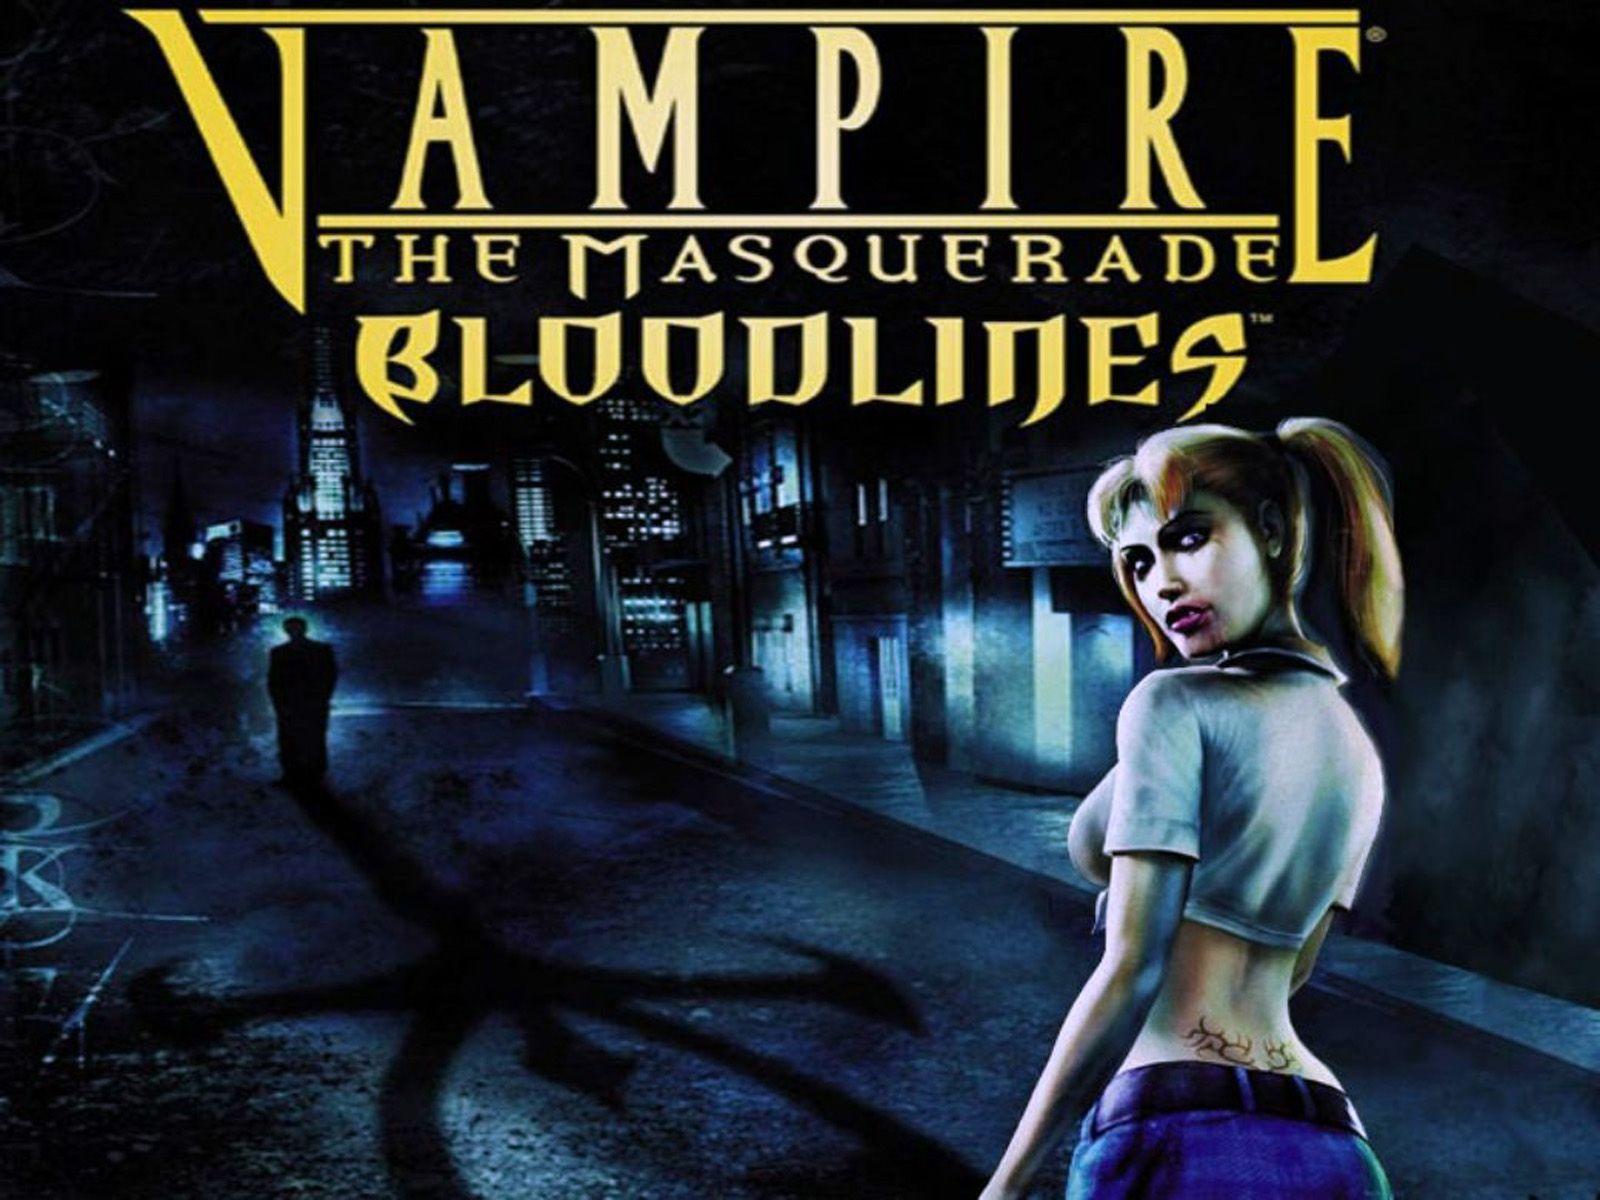 Vampire The Masquerade Bloodlines Cover Wallpaper Jpg Vampire